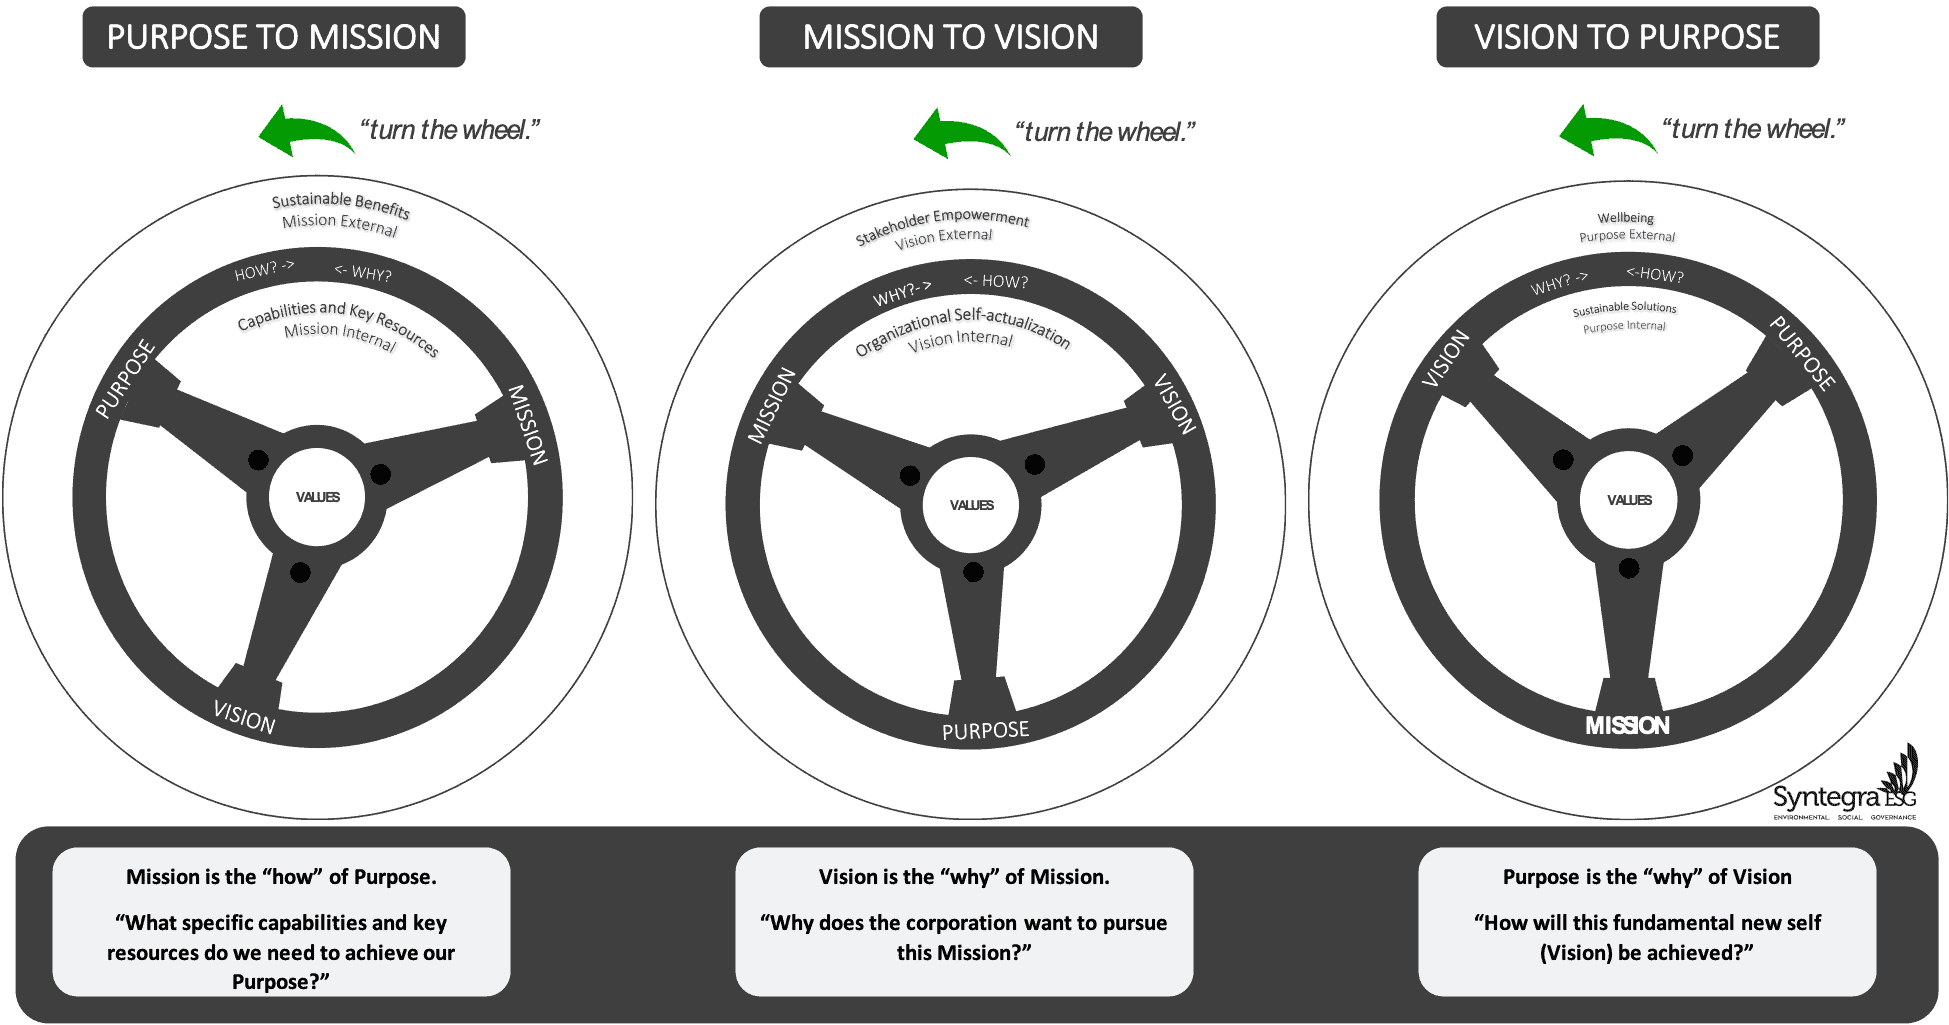 Turning the organizational purpose wheel